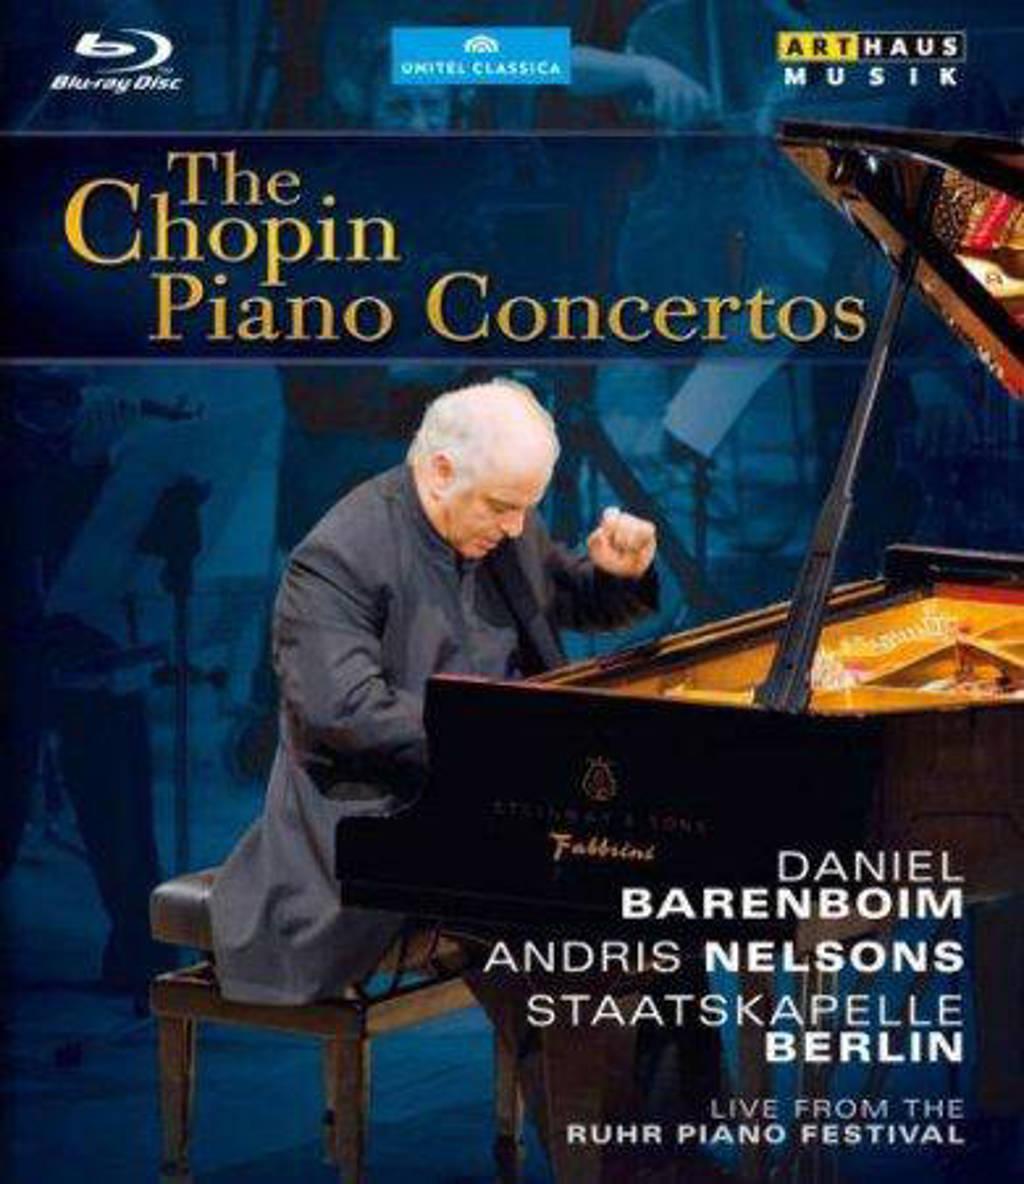 Staatskapelle Berlin Barenboim - Chopin Piano Concertos,Essen 2010Br (Blu-ray)